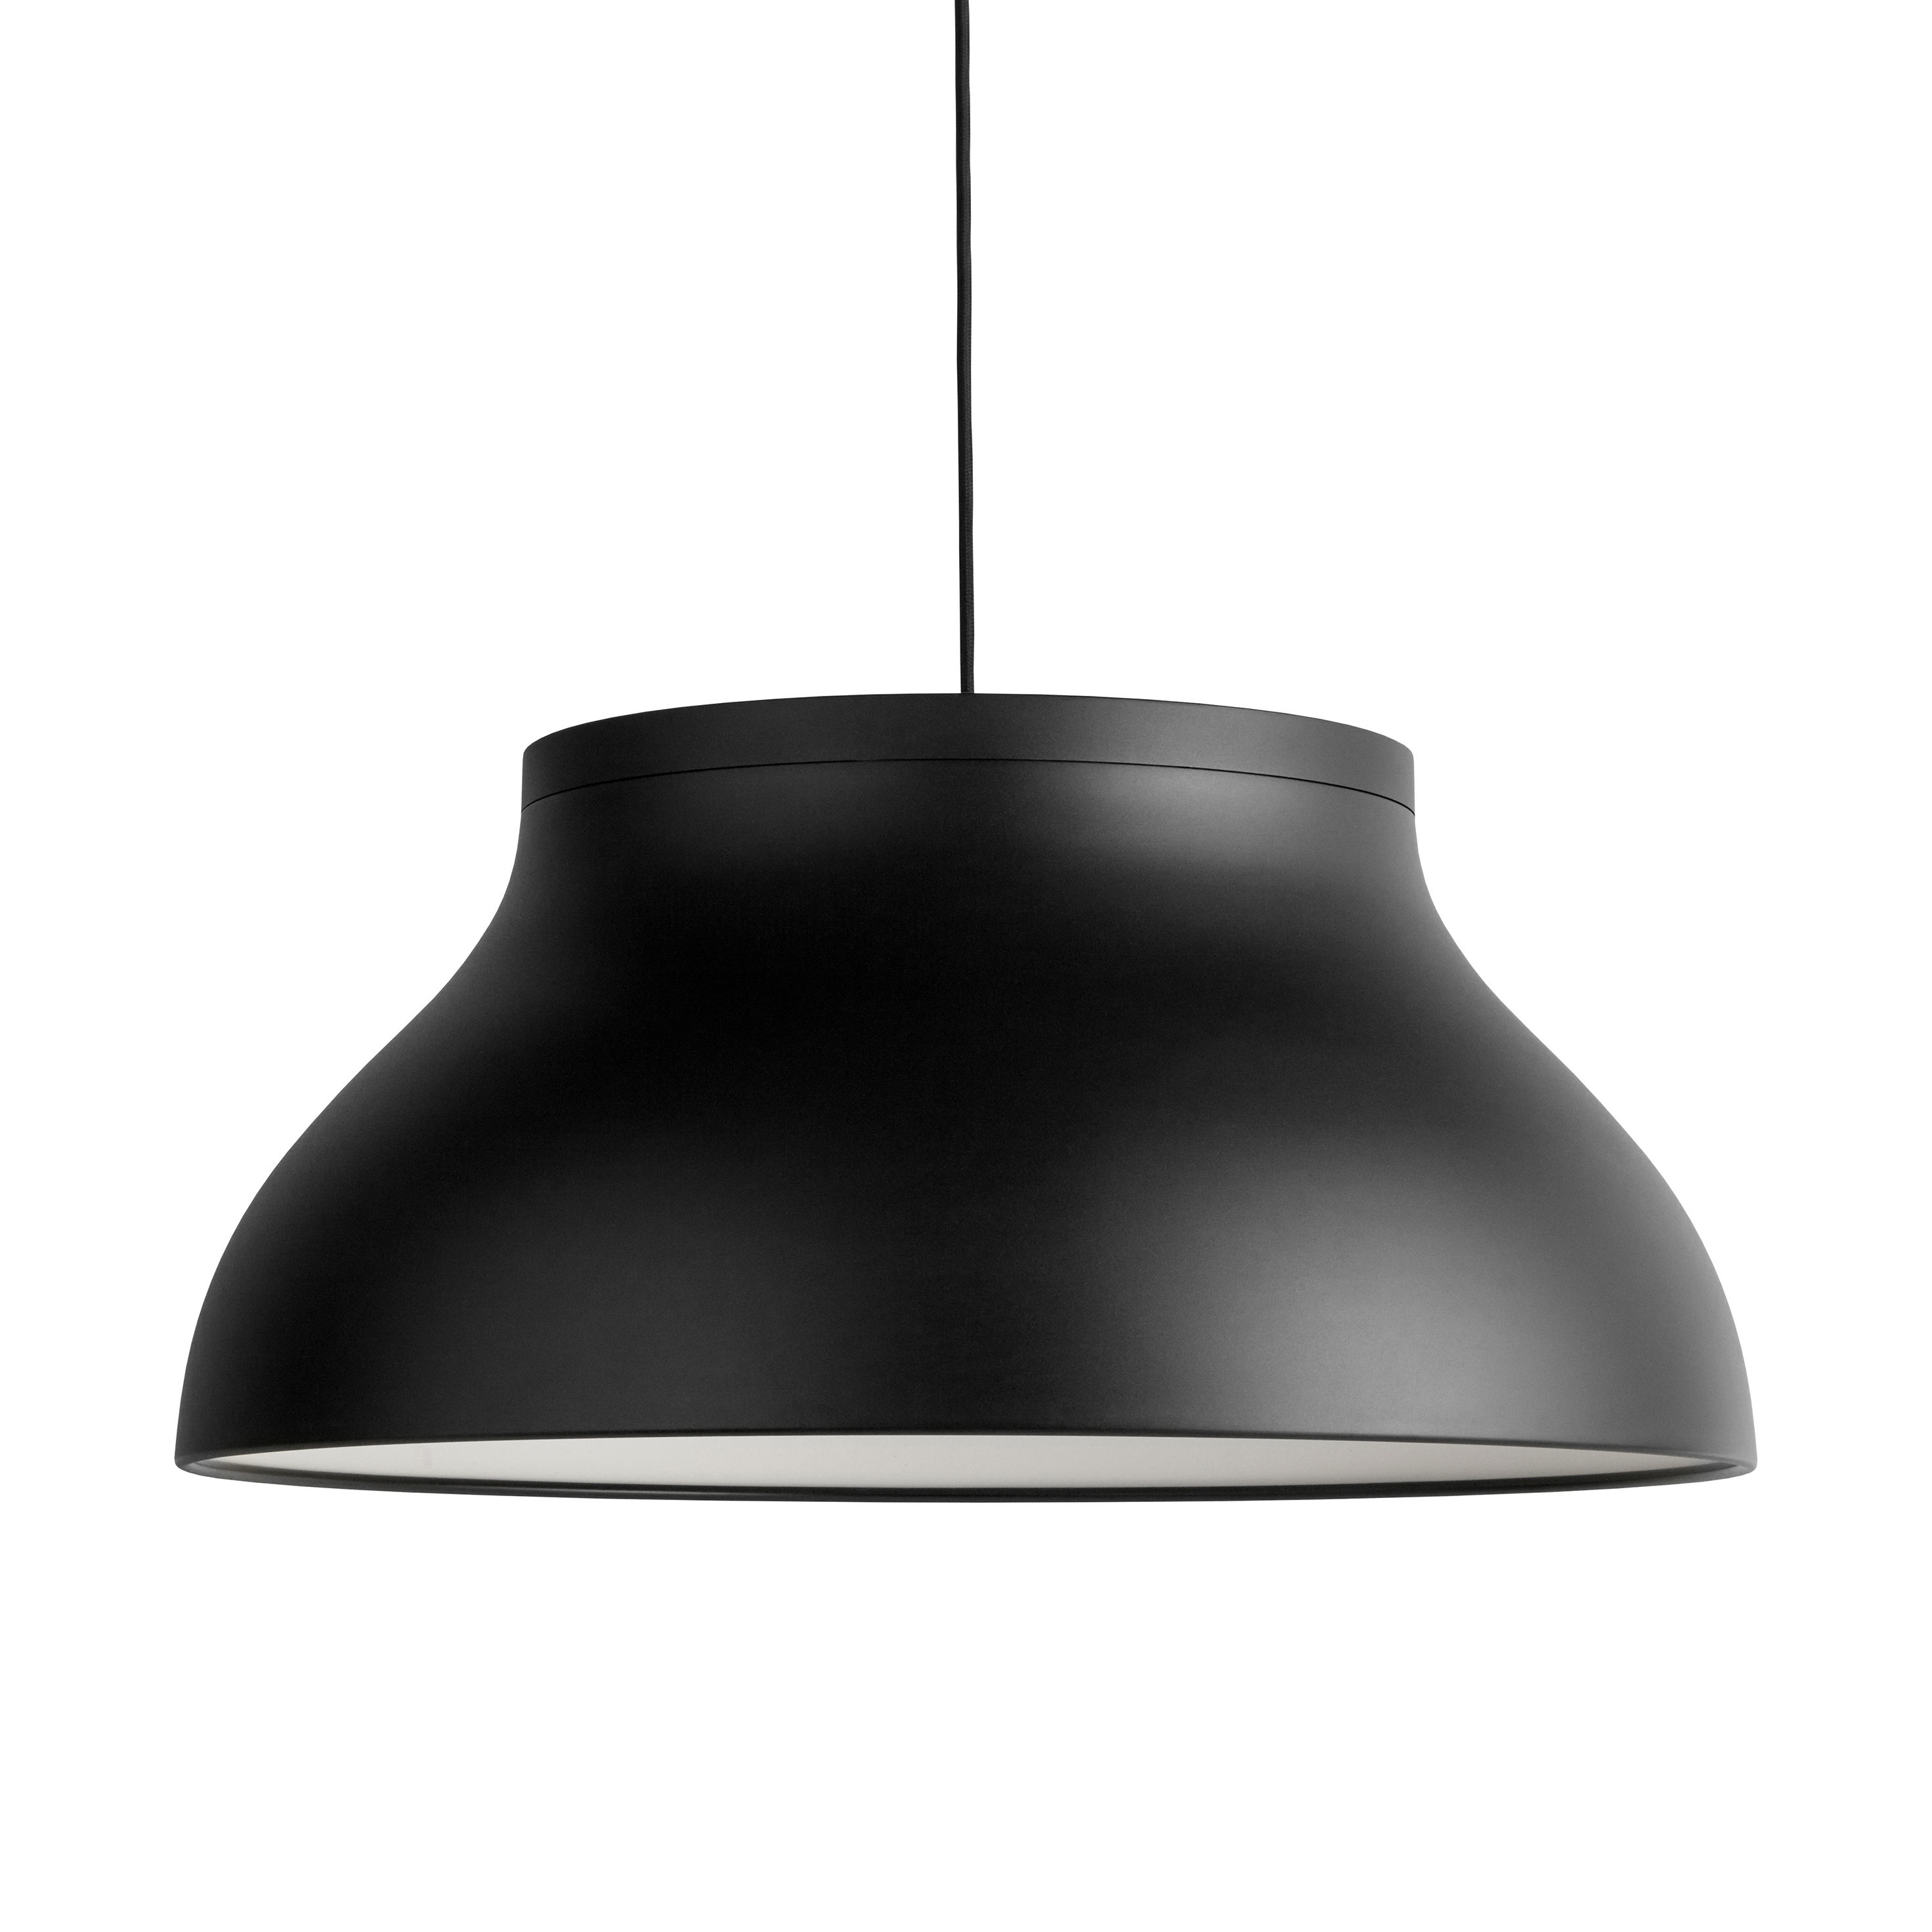 Lighting - Pendant Lighting - PC Large Pendant - / Ø 60 cm - Aluminium by Hay - Black - Anodized aluminium